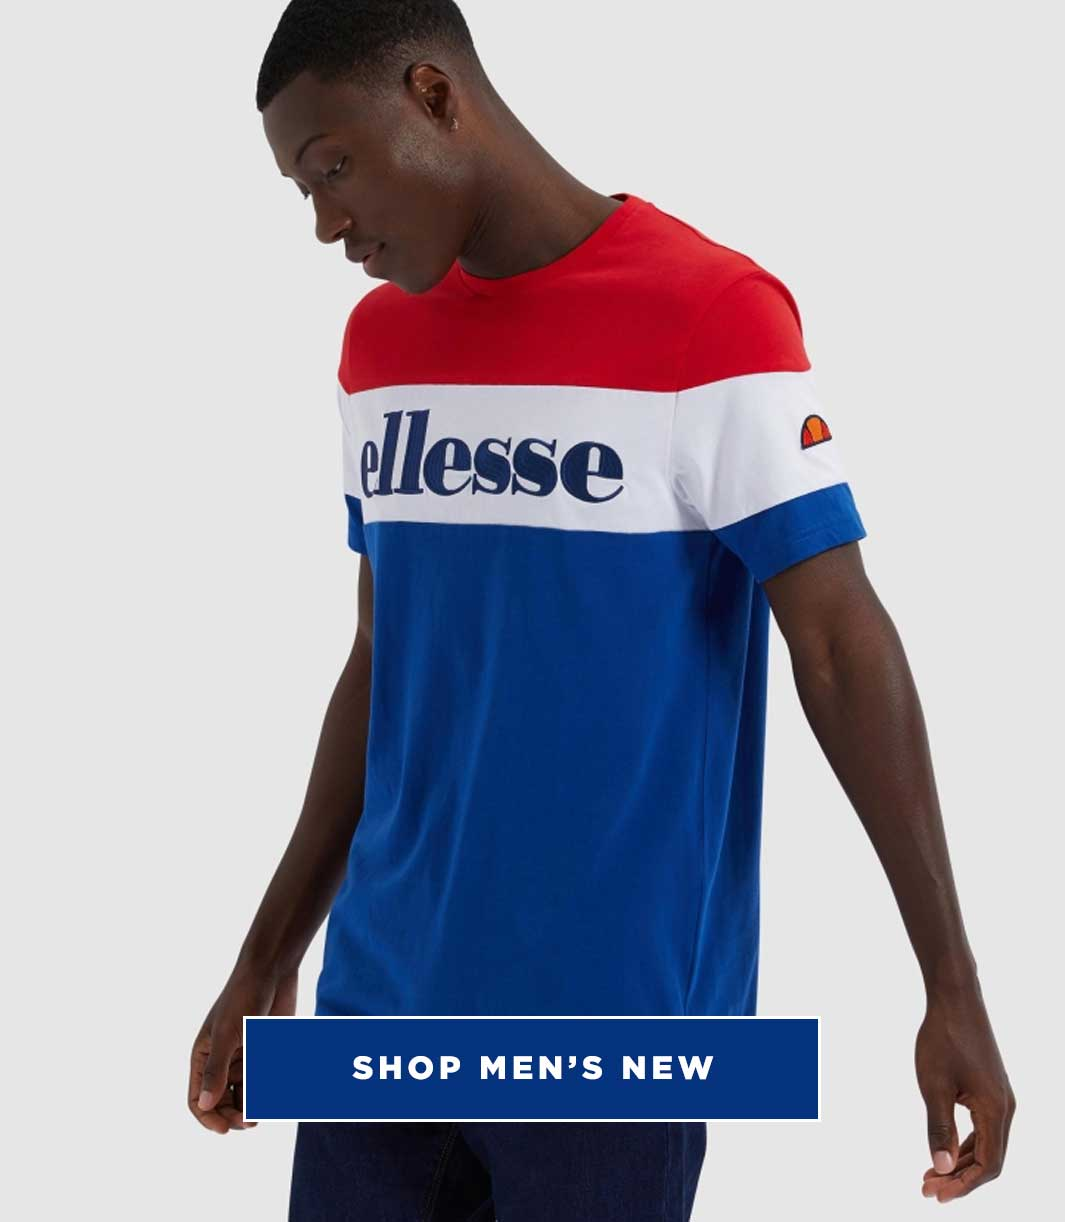 Men's New Shirts